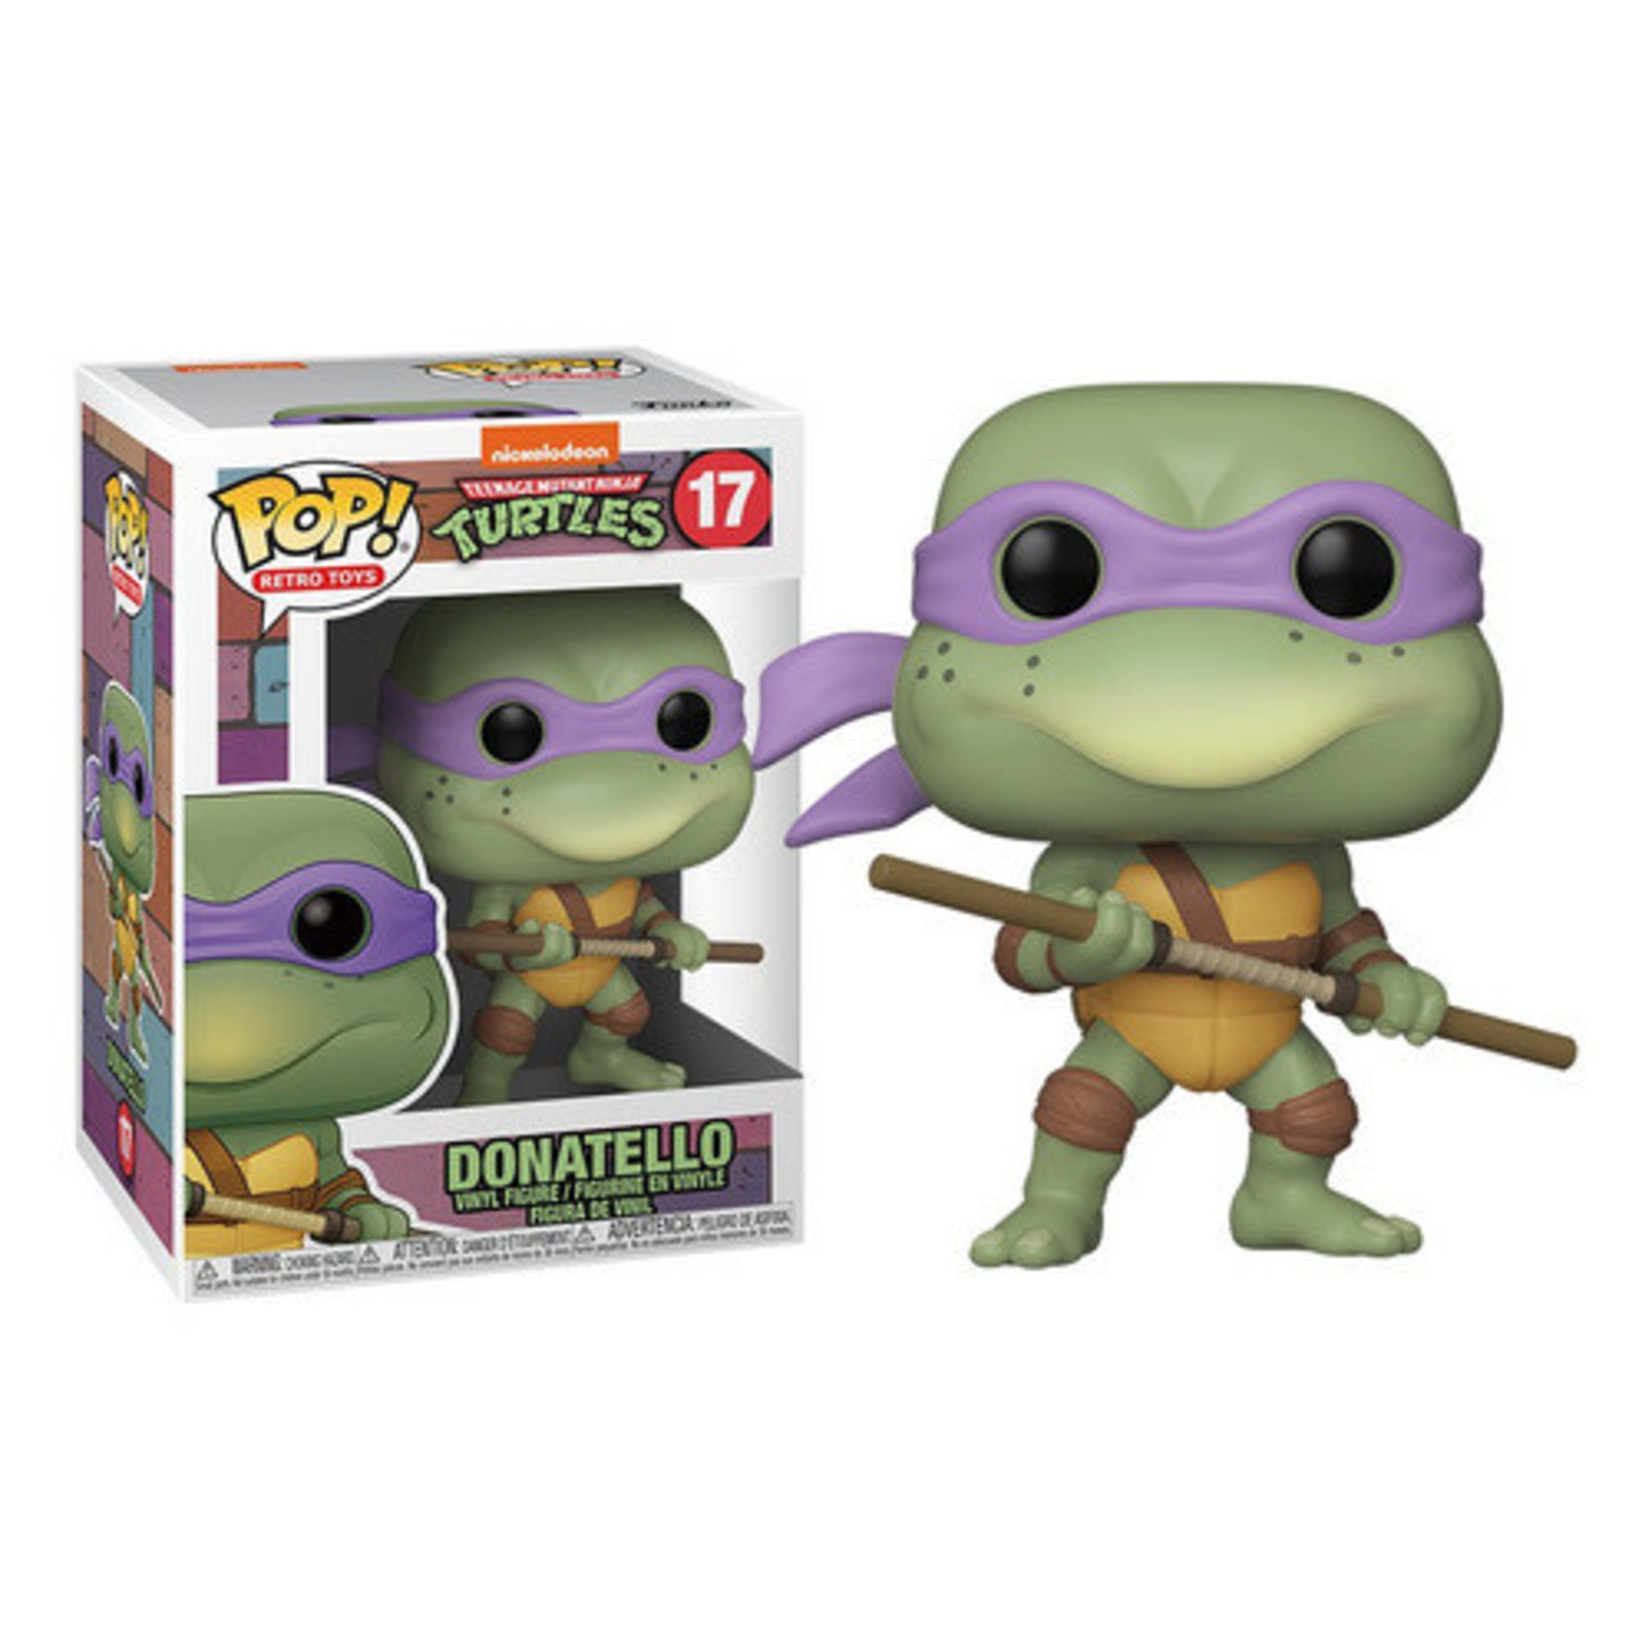 Funko Pop! Retro Toys: Teenage Mutant Ninja Turtles #17 - Donatello